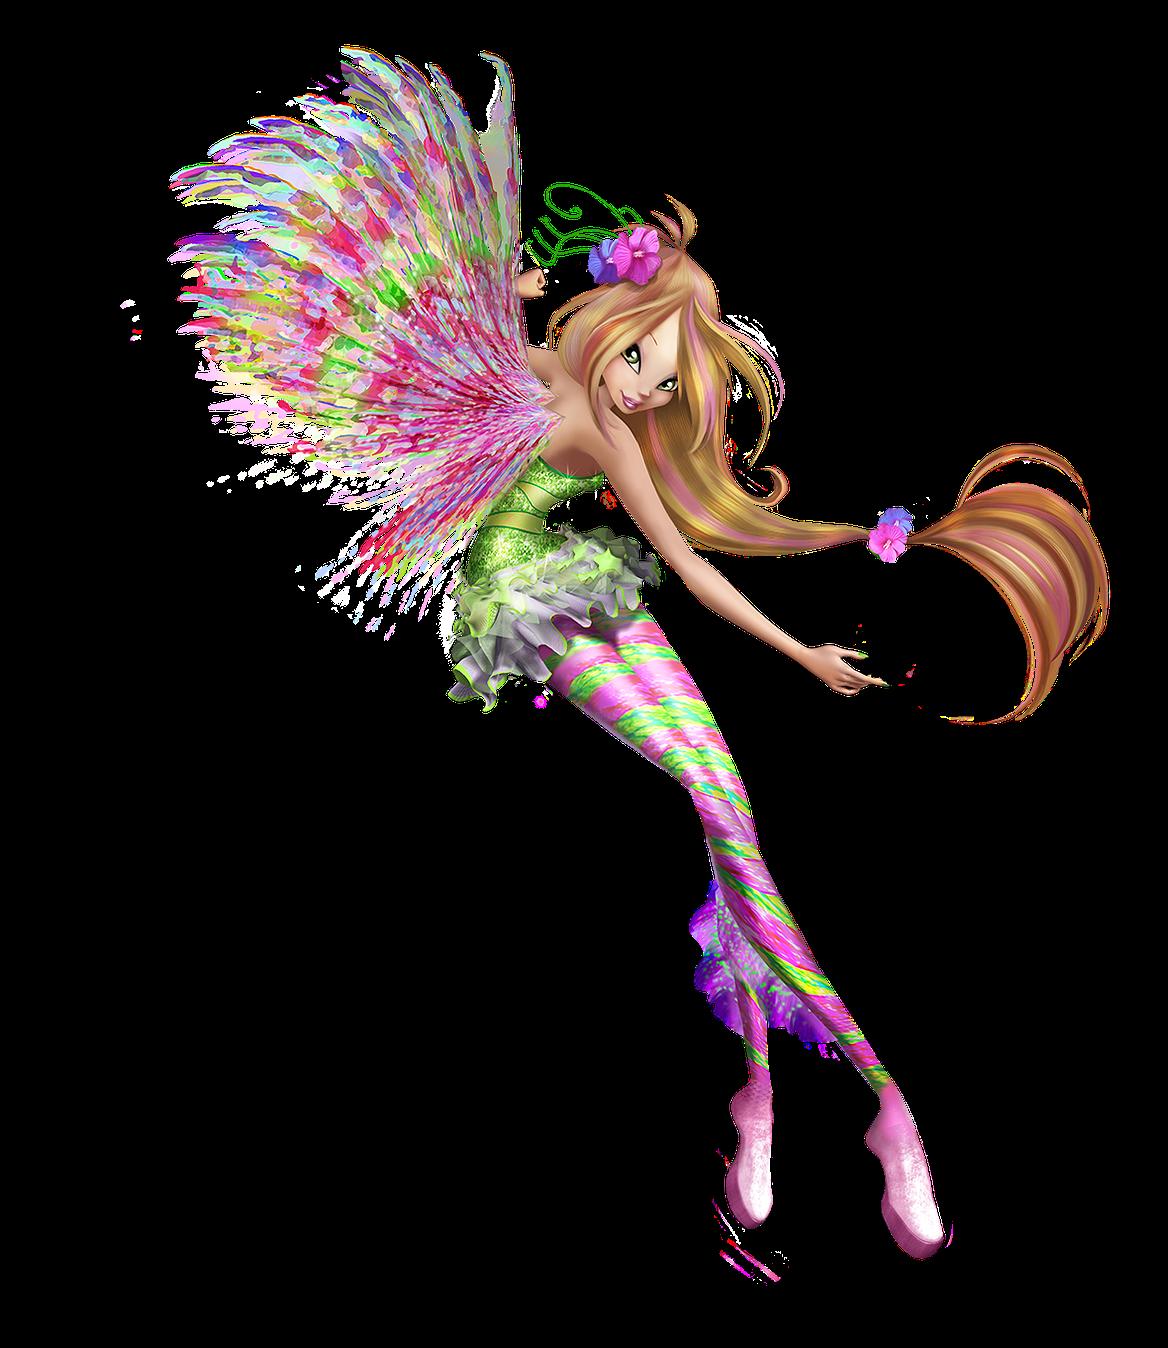 Winx club fairies flora new pictures - Winx club sirenix ...